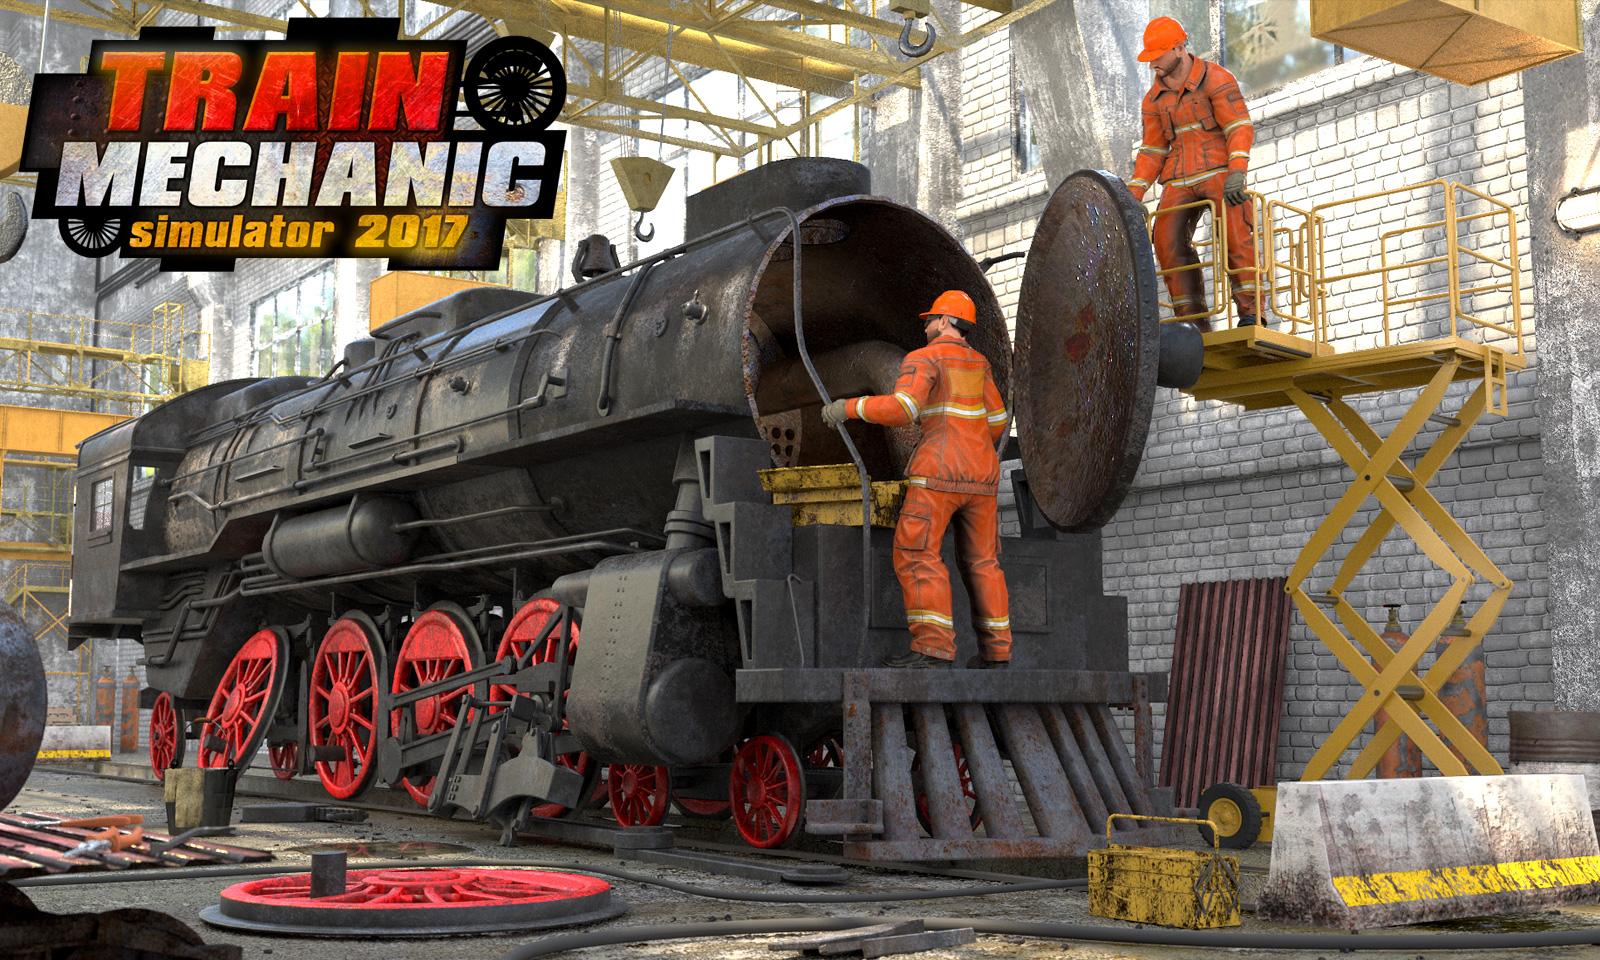 Train Mechanic Simulator 2017 [Online Game Code]